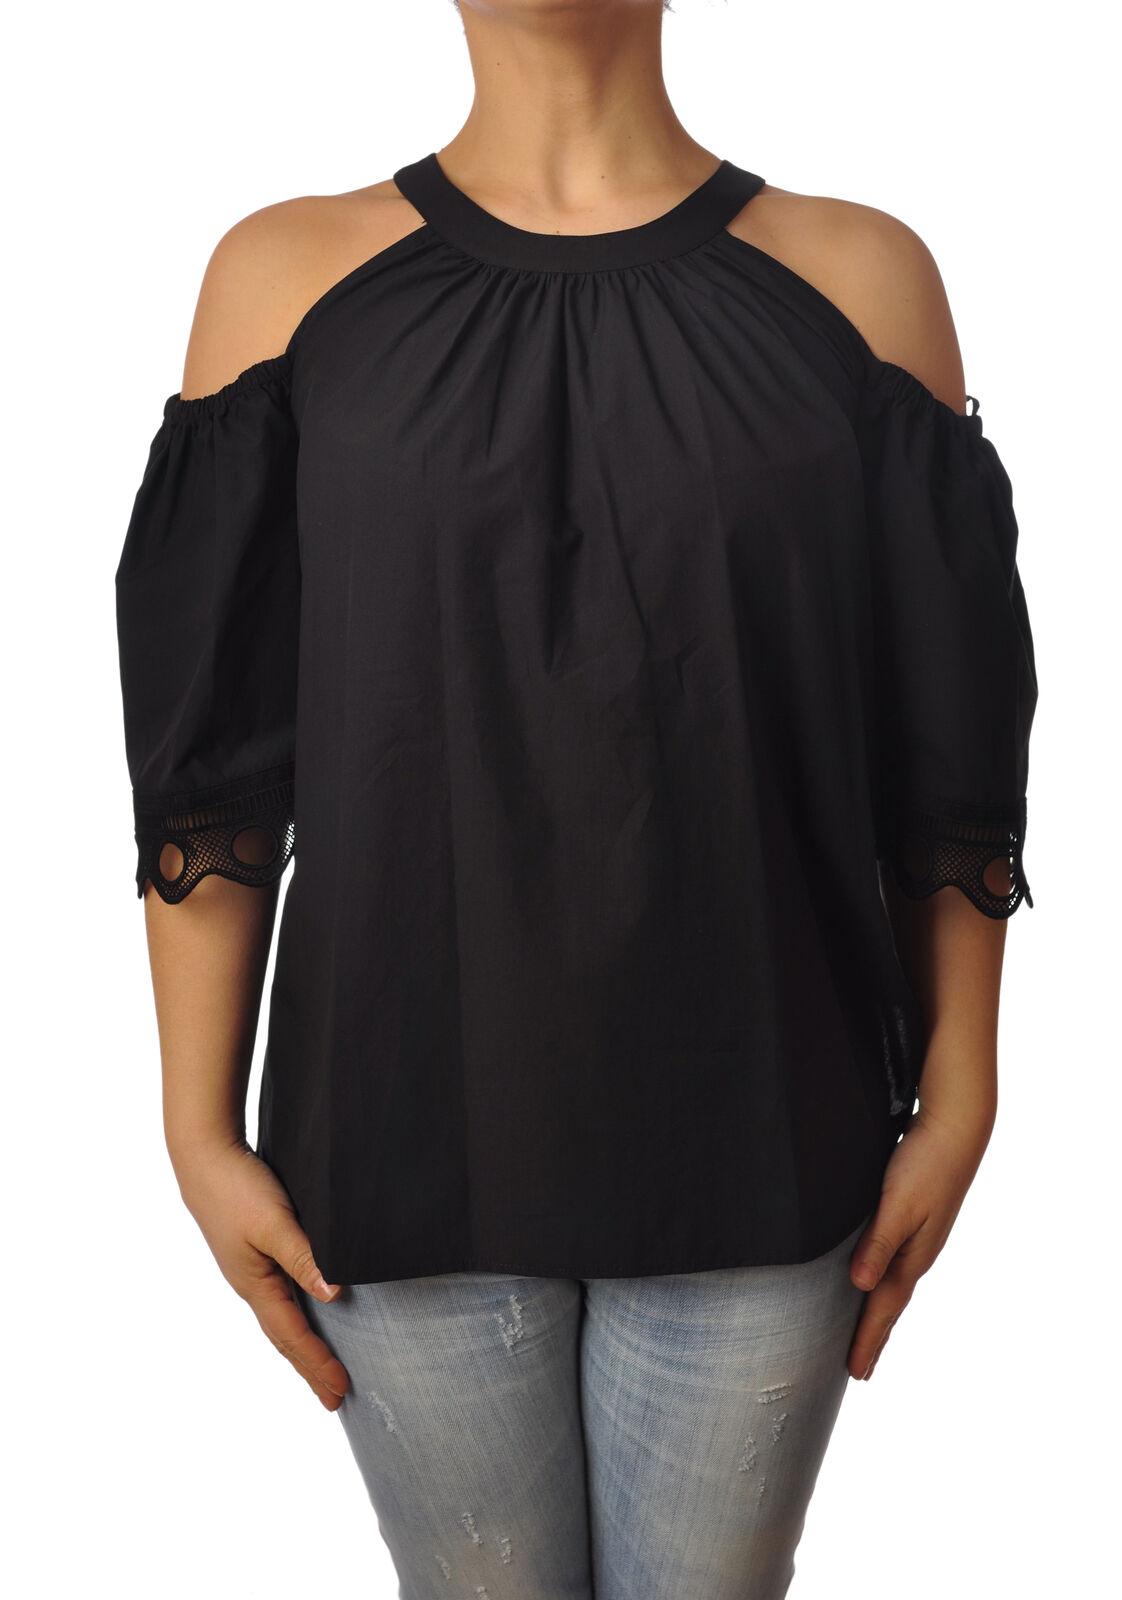 Ottod'ame - Shirts-Shirt - Woman - schwarz - 4950115G181133